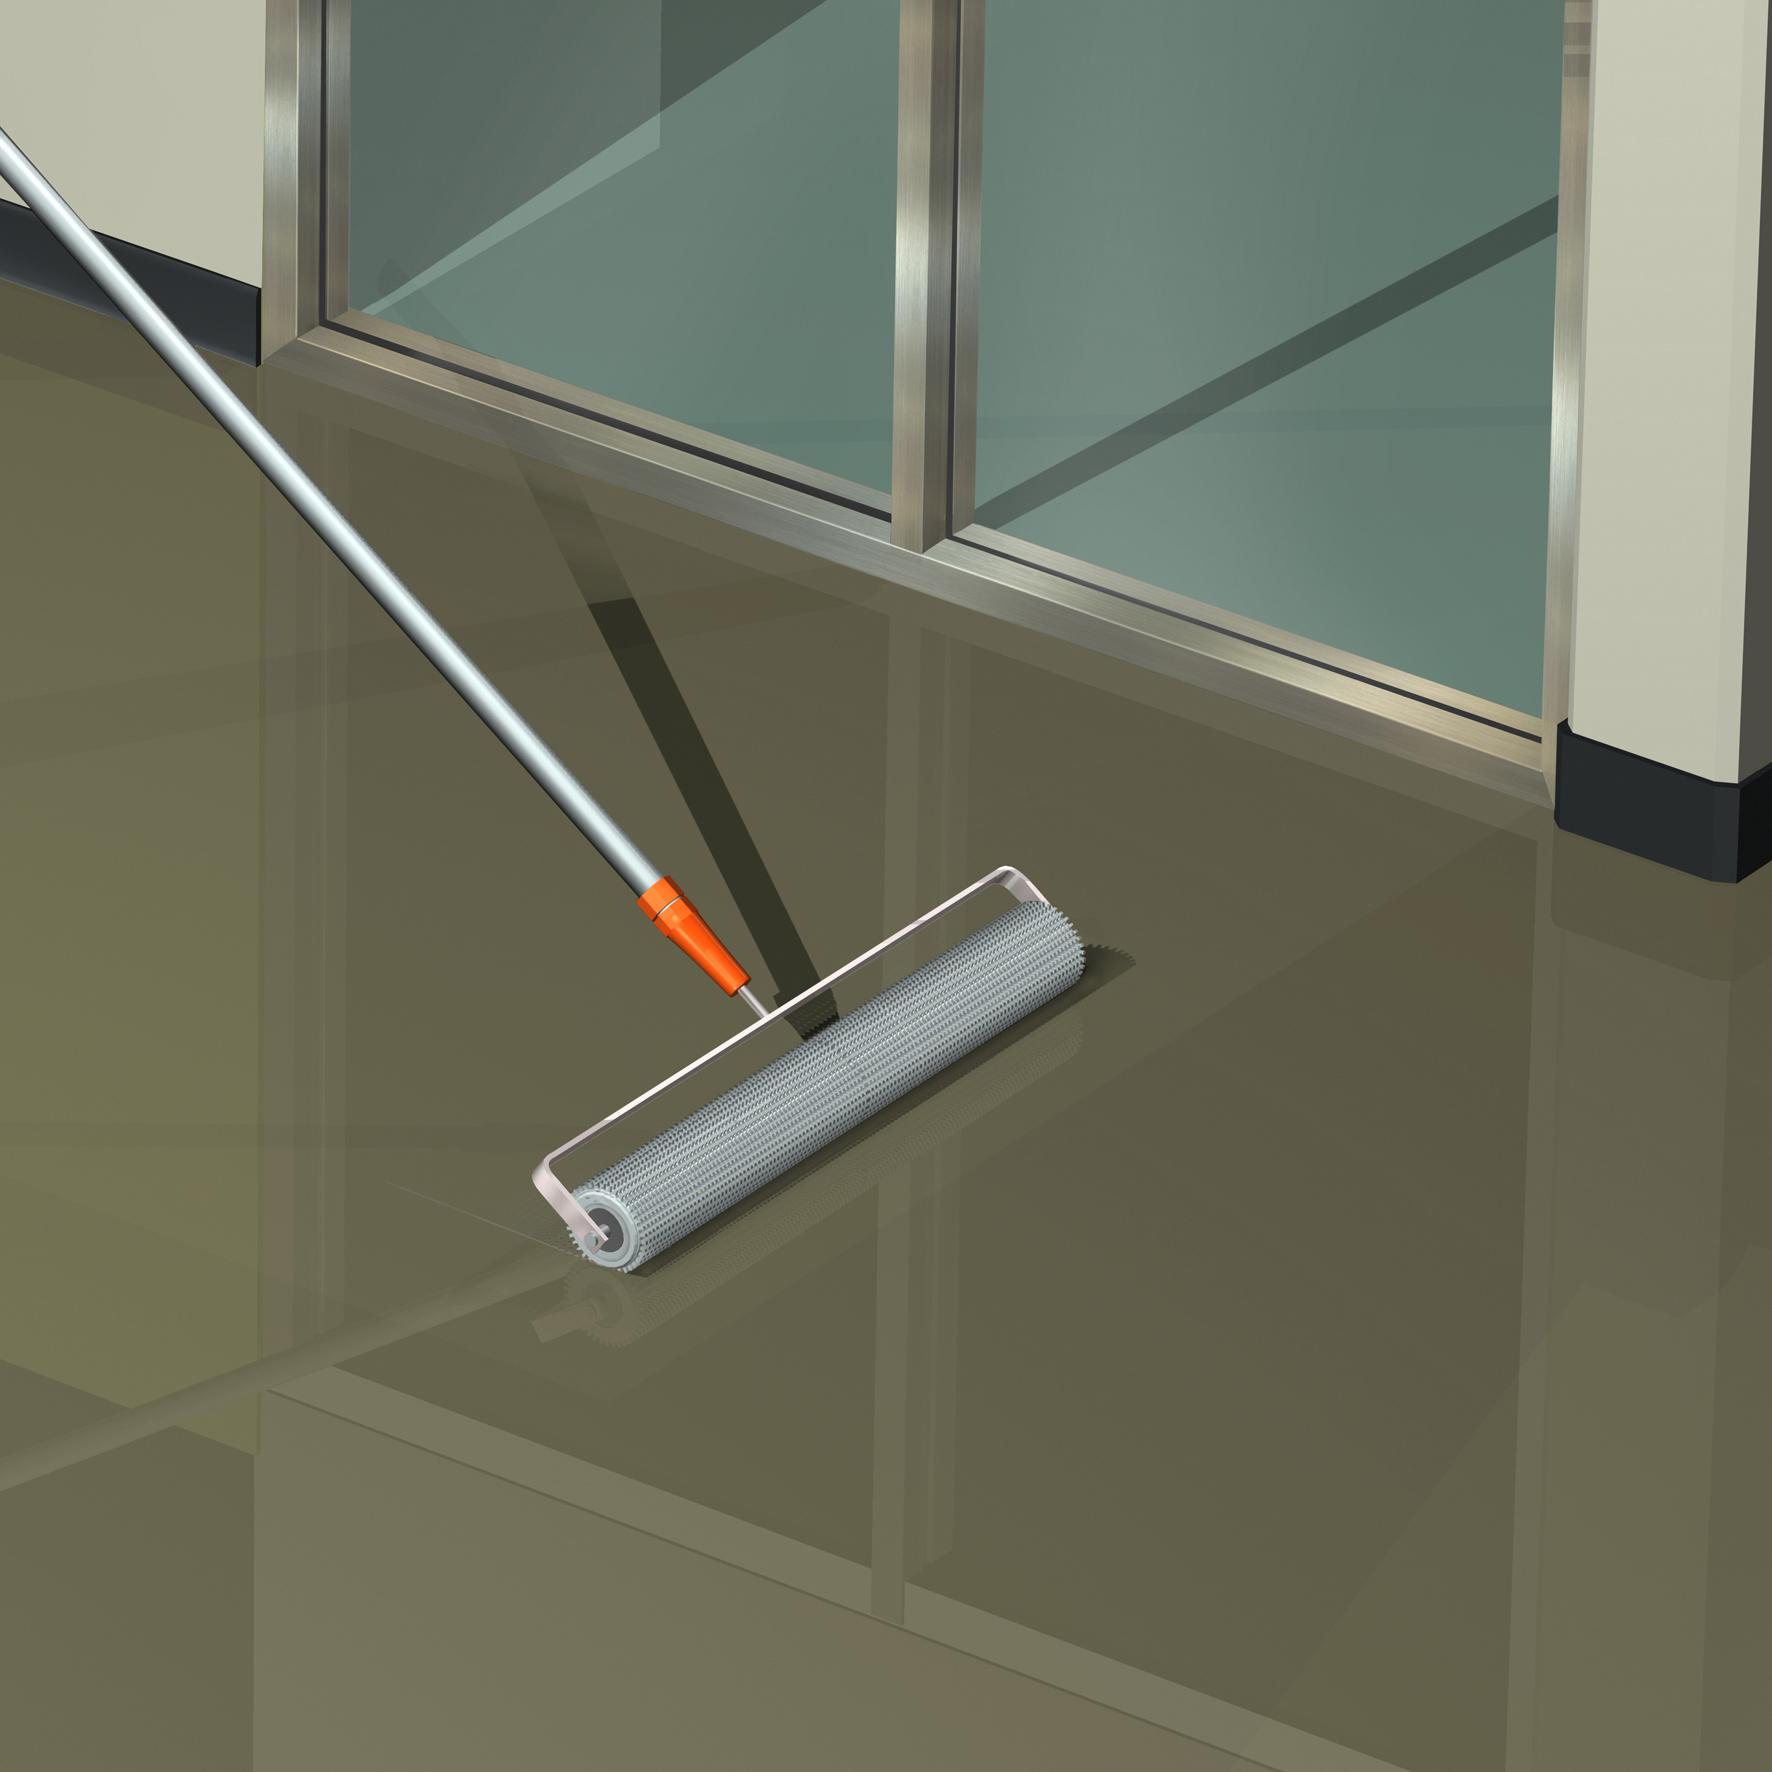 Sapa autonivelanta pe baza de ciment cu intarire rapida - Produs si aplicare SIKA - Poza 5